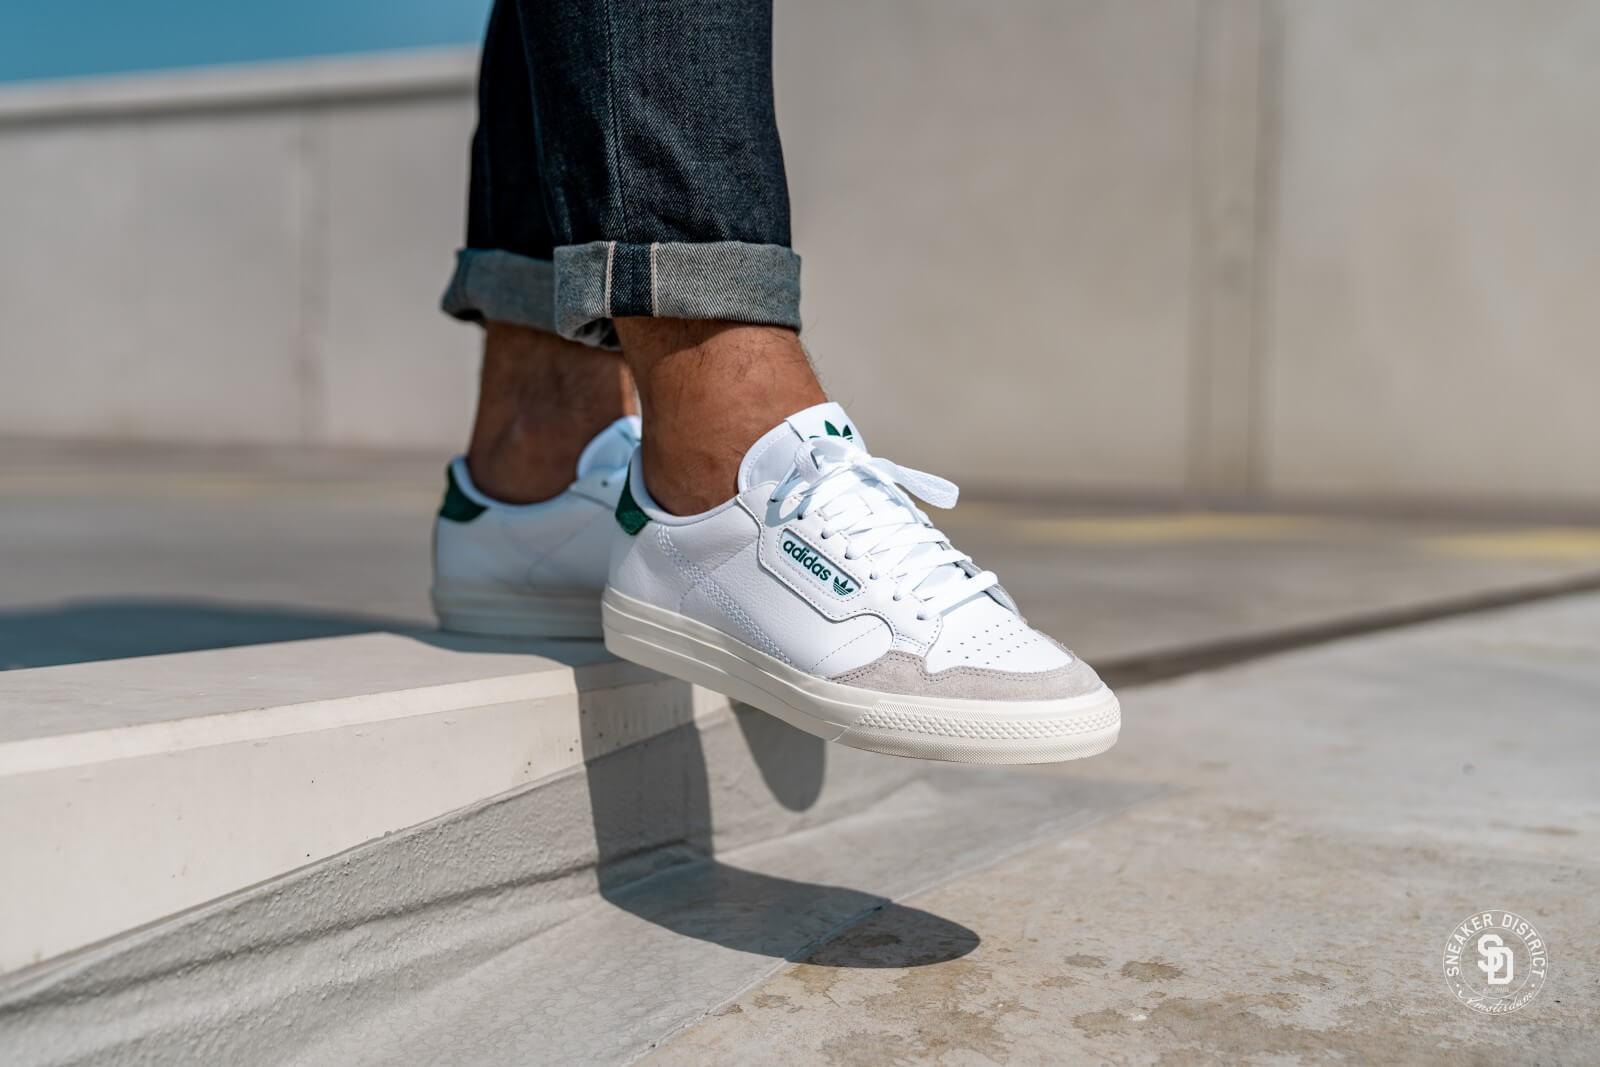 Adidas Continental Vulc Cloud White/Collegiate Green - EF3534